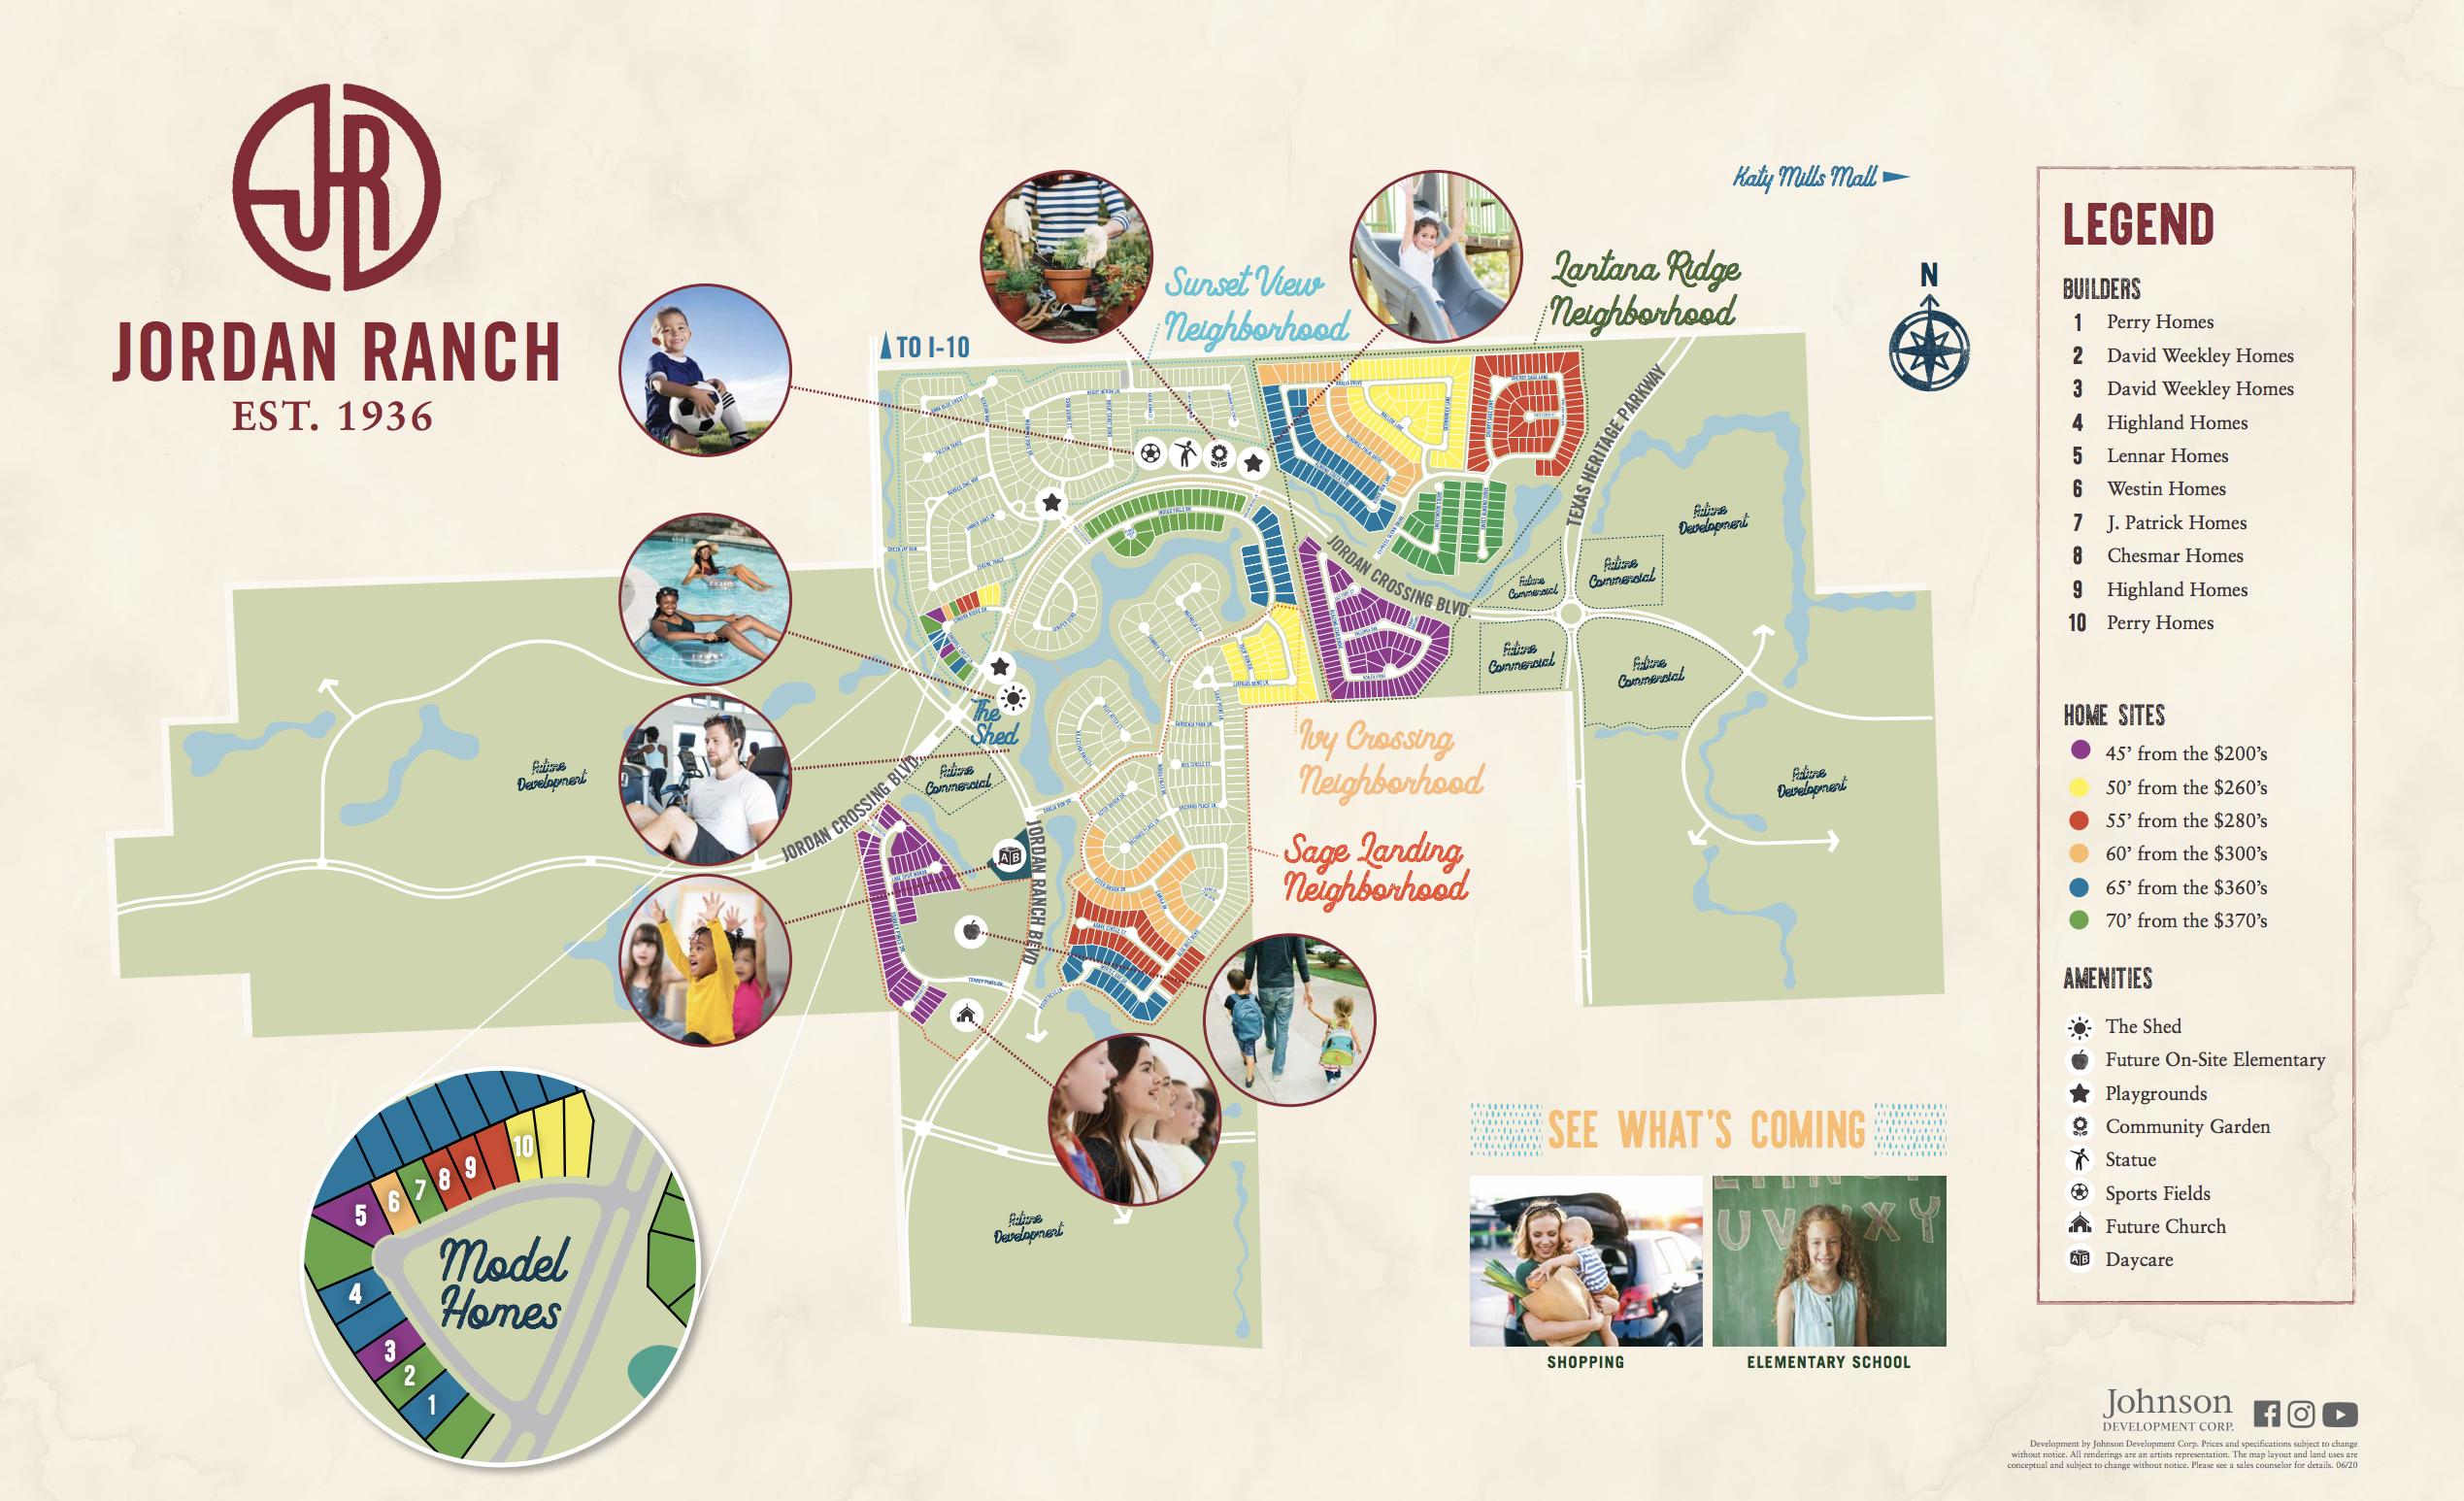 jordan ranch master planned community map